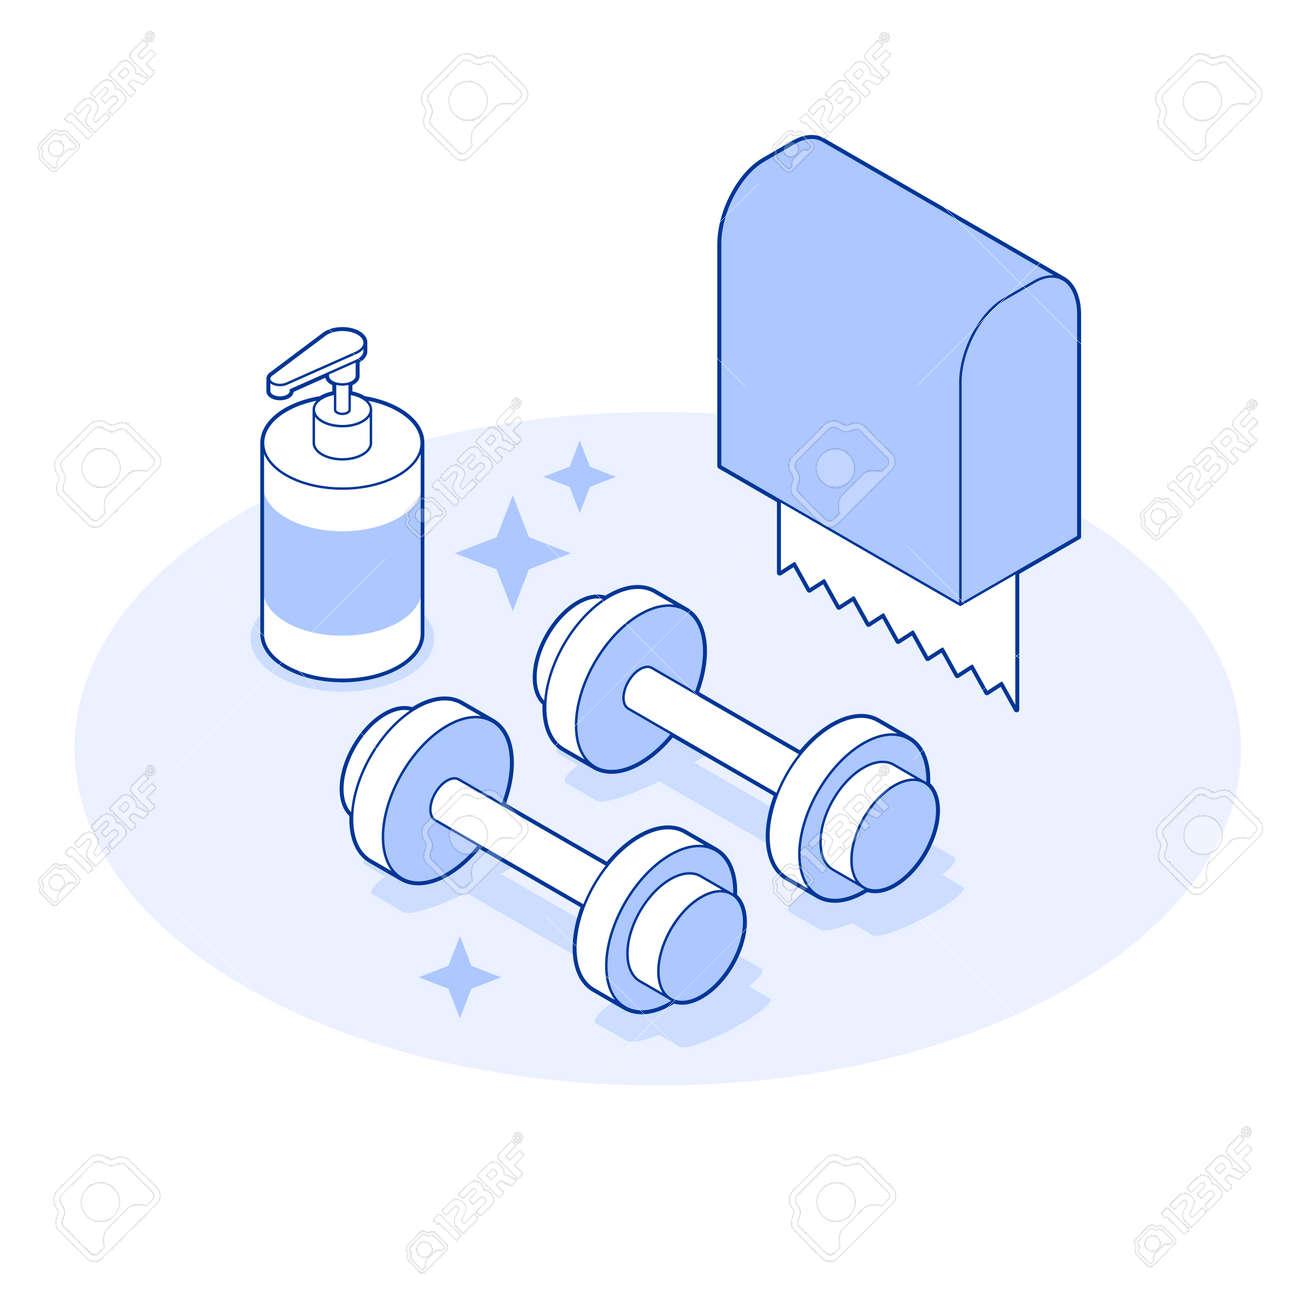 Isometric Gym Vector Illustration - 171174745